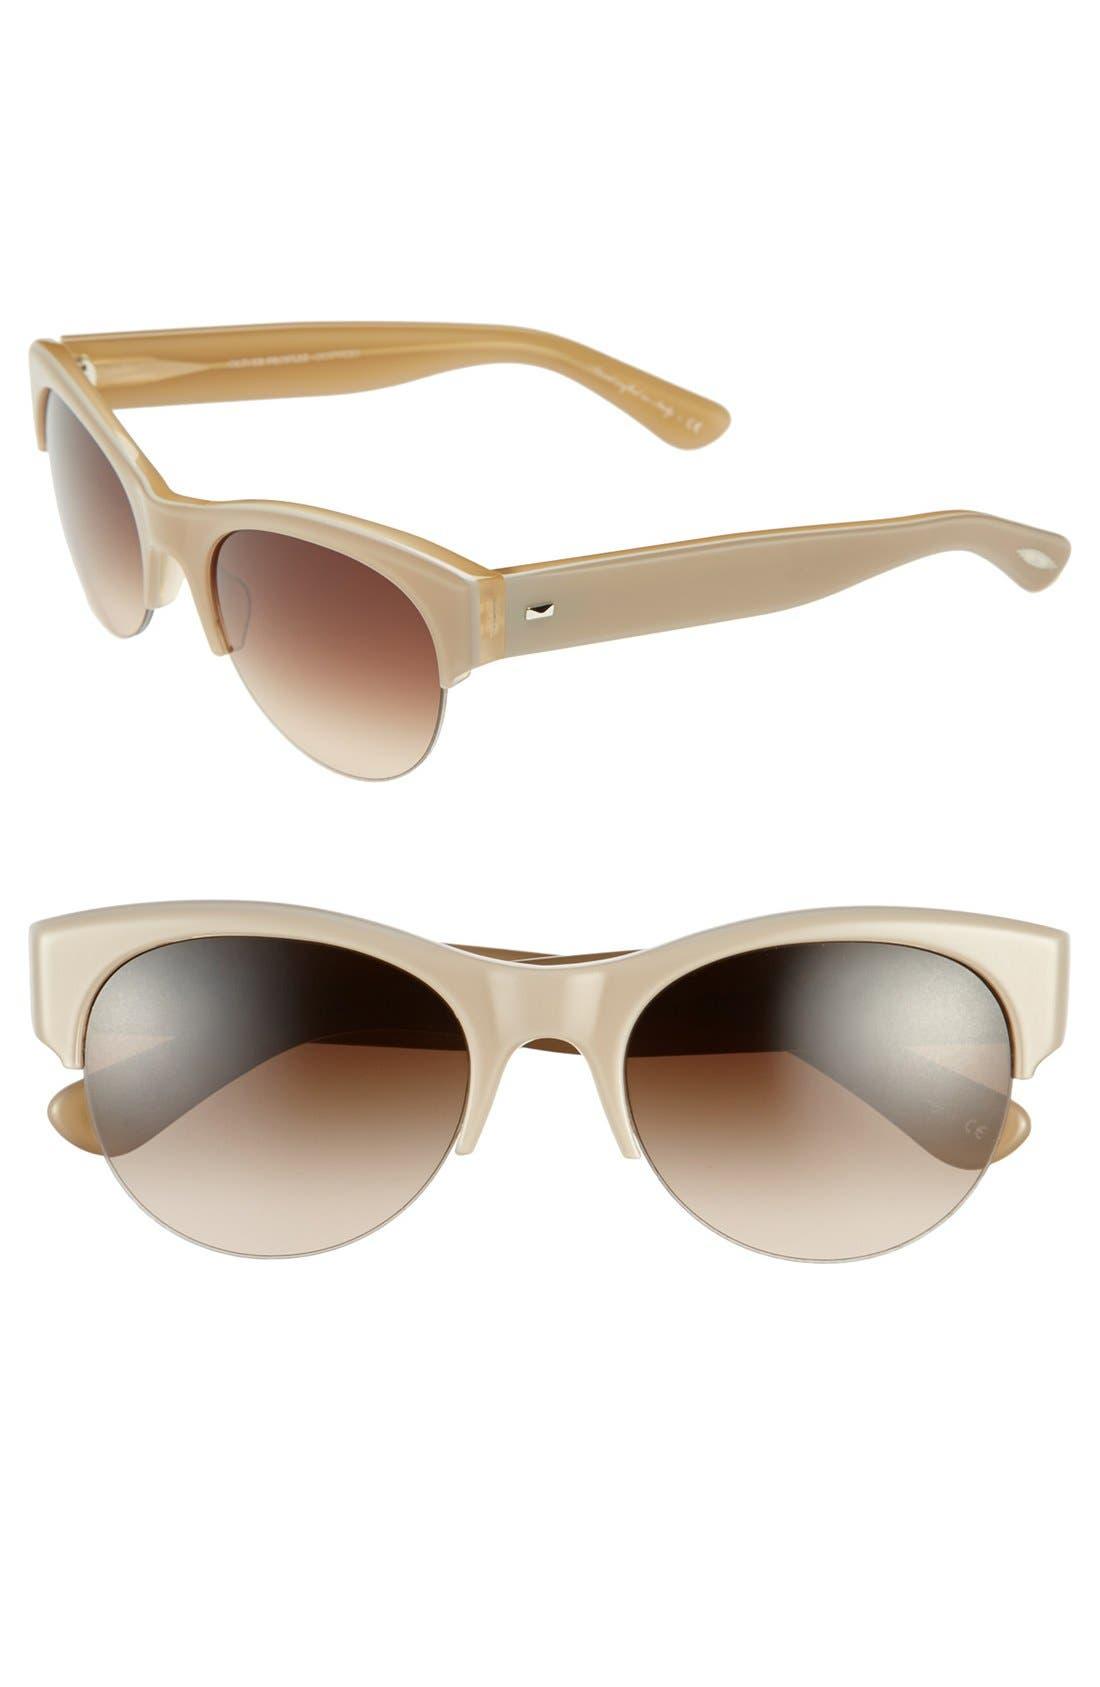 Main Image - Oliver Peoples 'Louella' 55mm Sunglasses